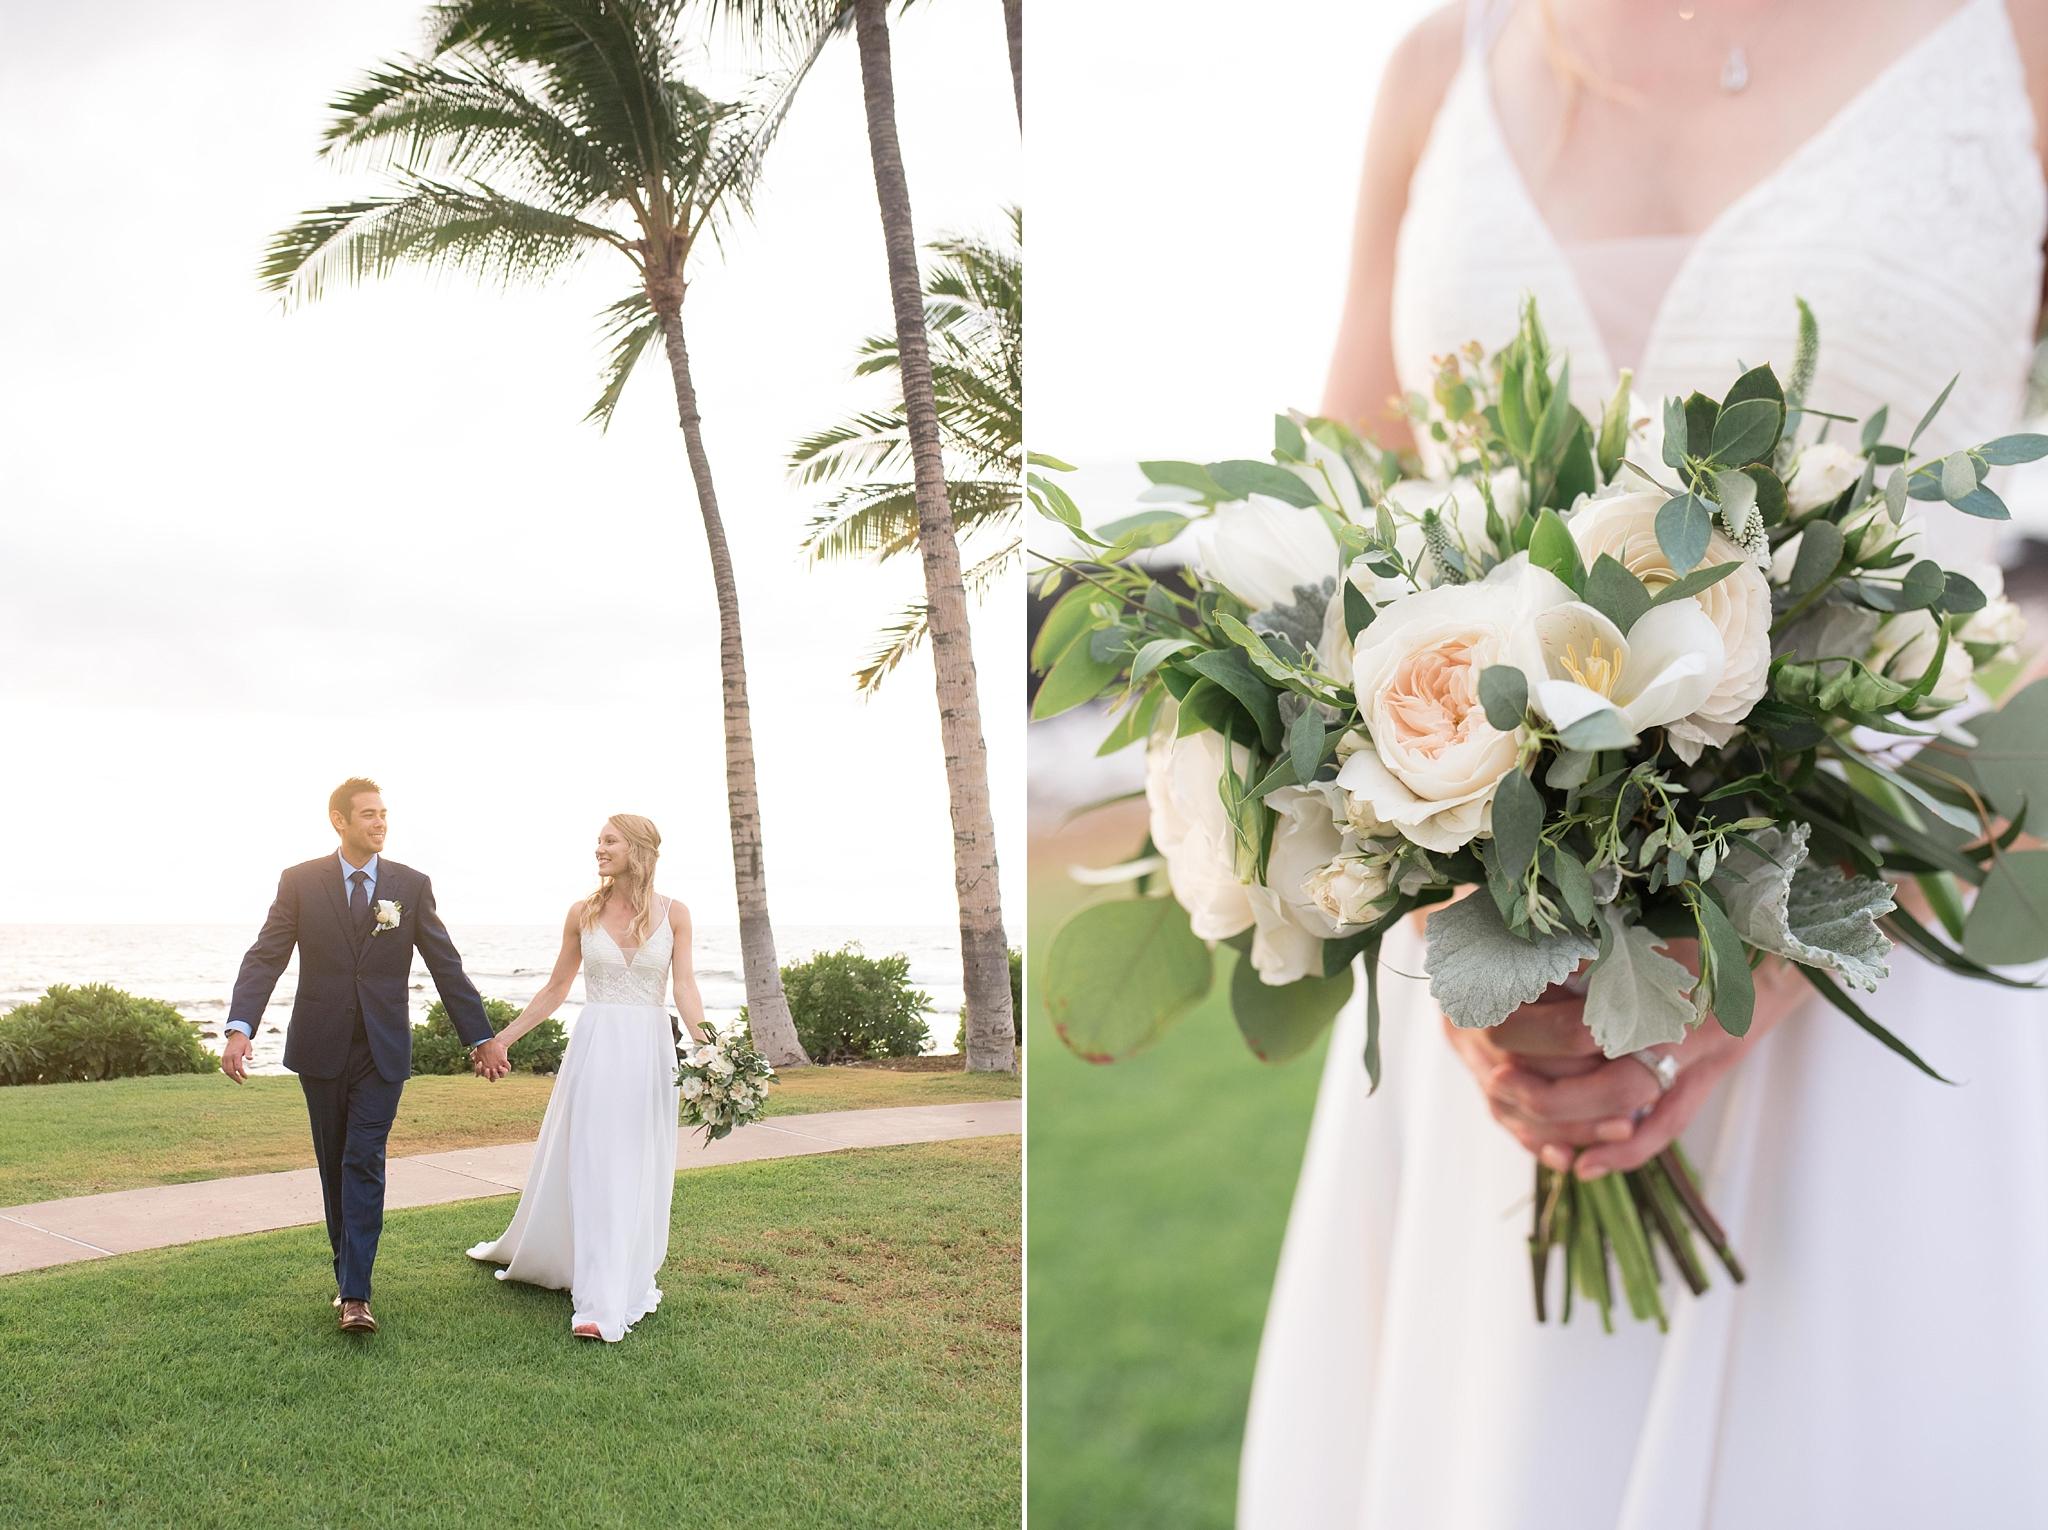 fairmont orchid kona hawaii wedding destination photographer beach resort wedding grace flower suits unlimited dj tiger martha stewart weddings